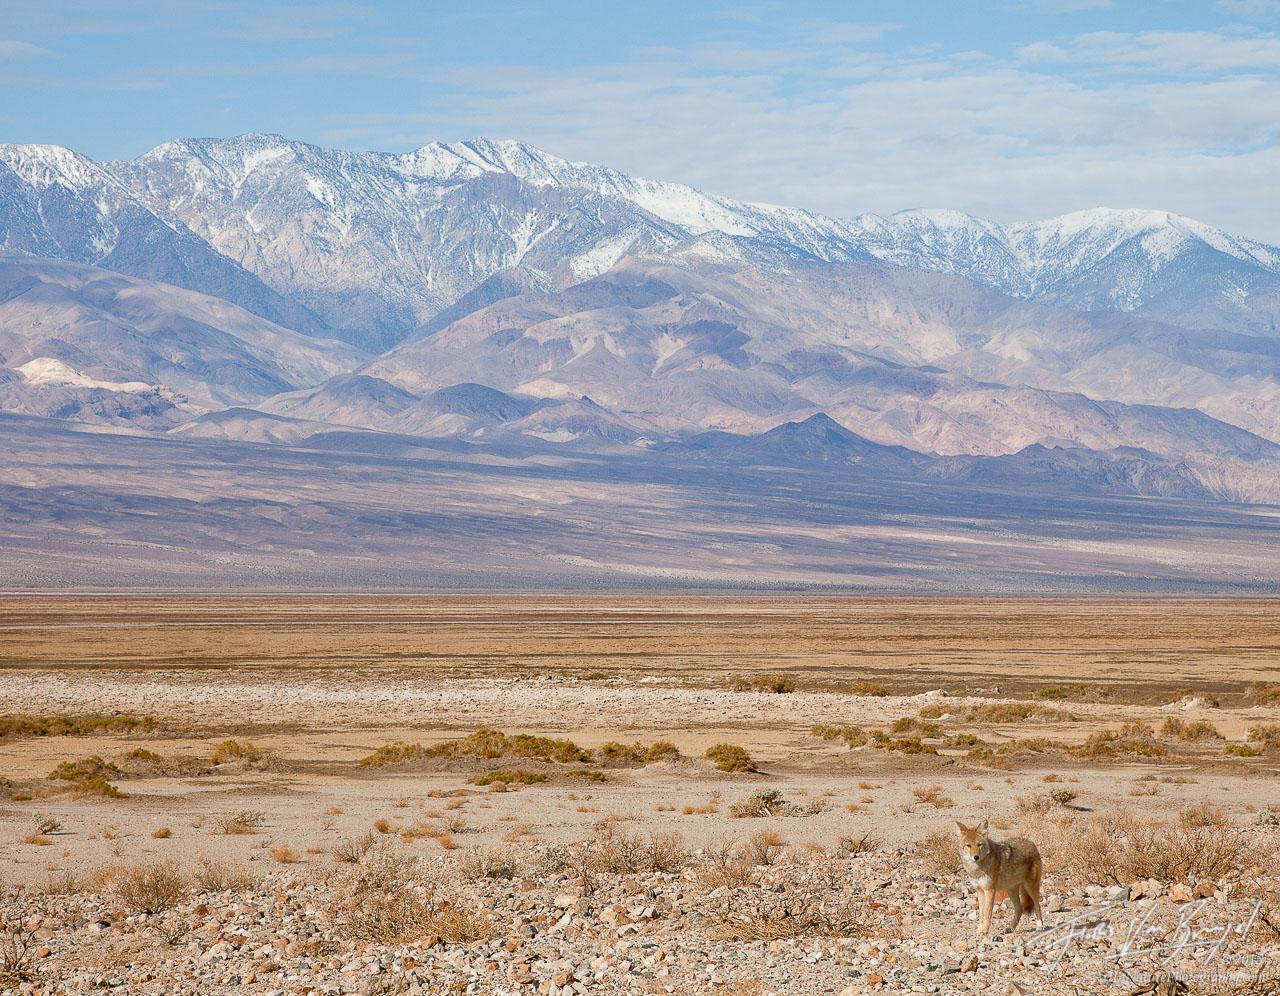 Coyote, Death Valley National Park, Telescope Peak, photo